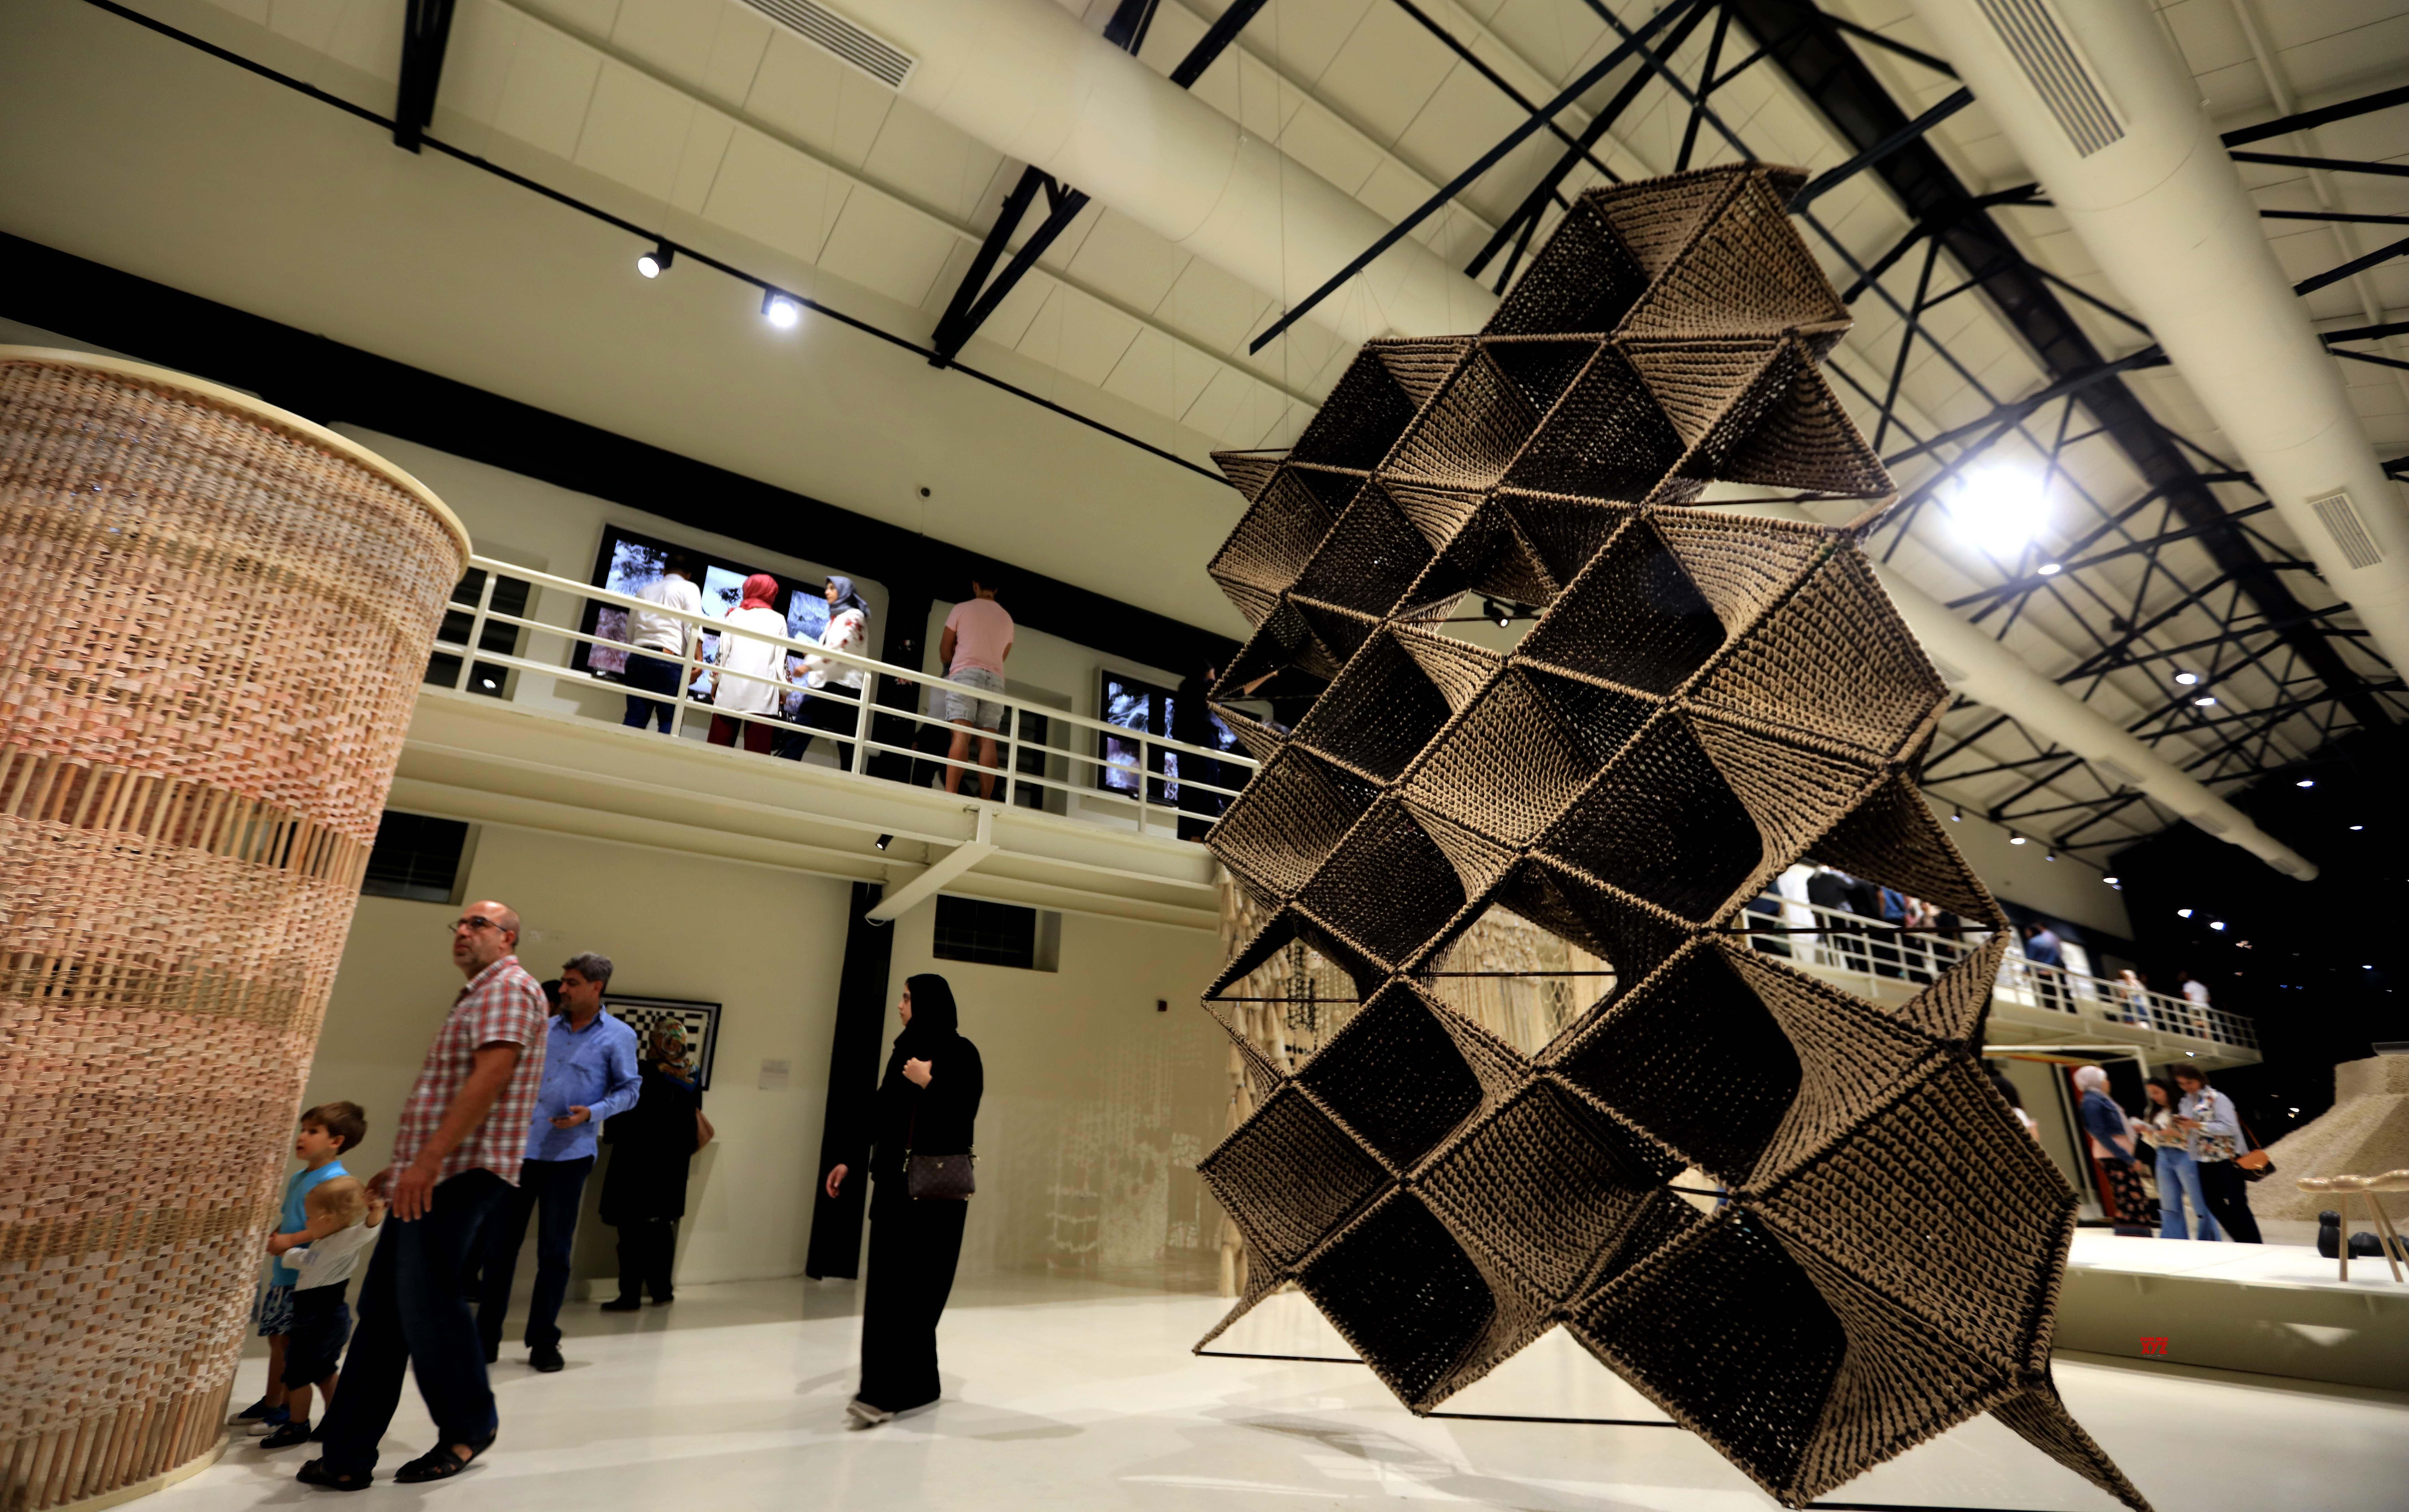 JORDAN - AMMAN - DESIGN WEEK - HANGAR EXHIBITION #Gallery